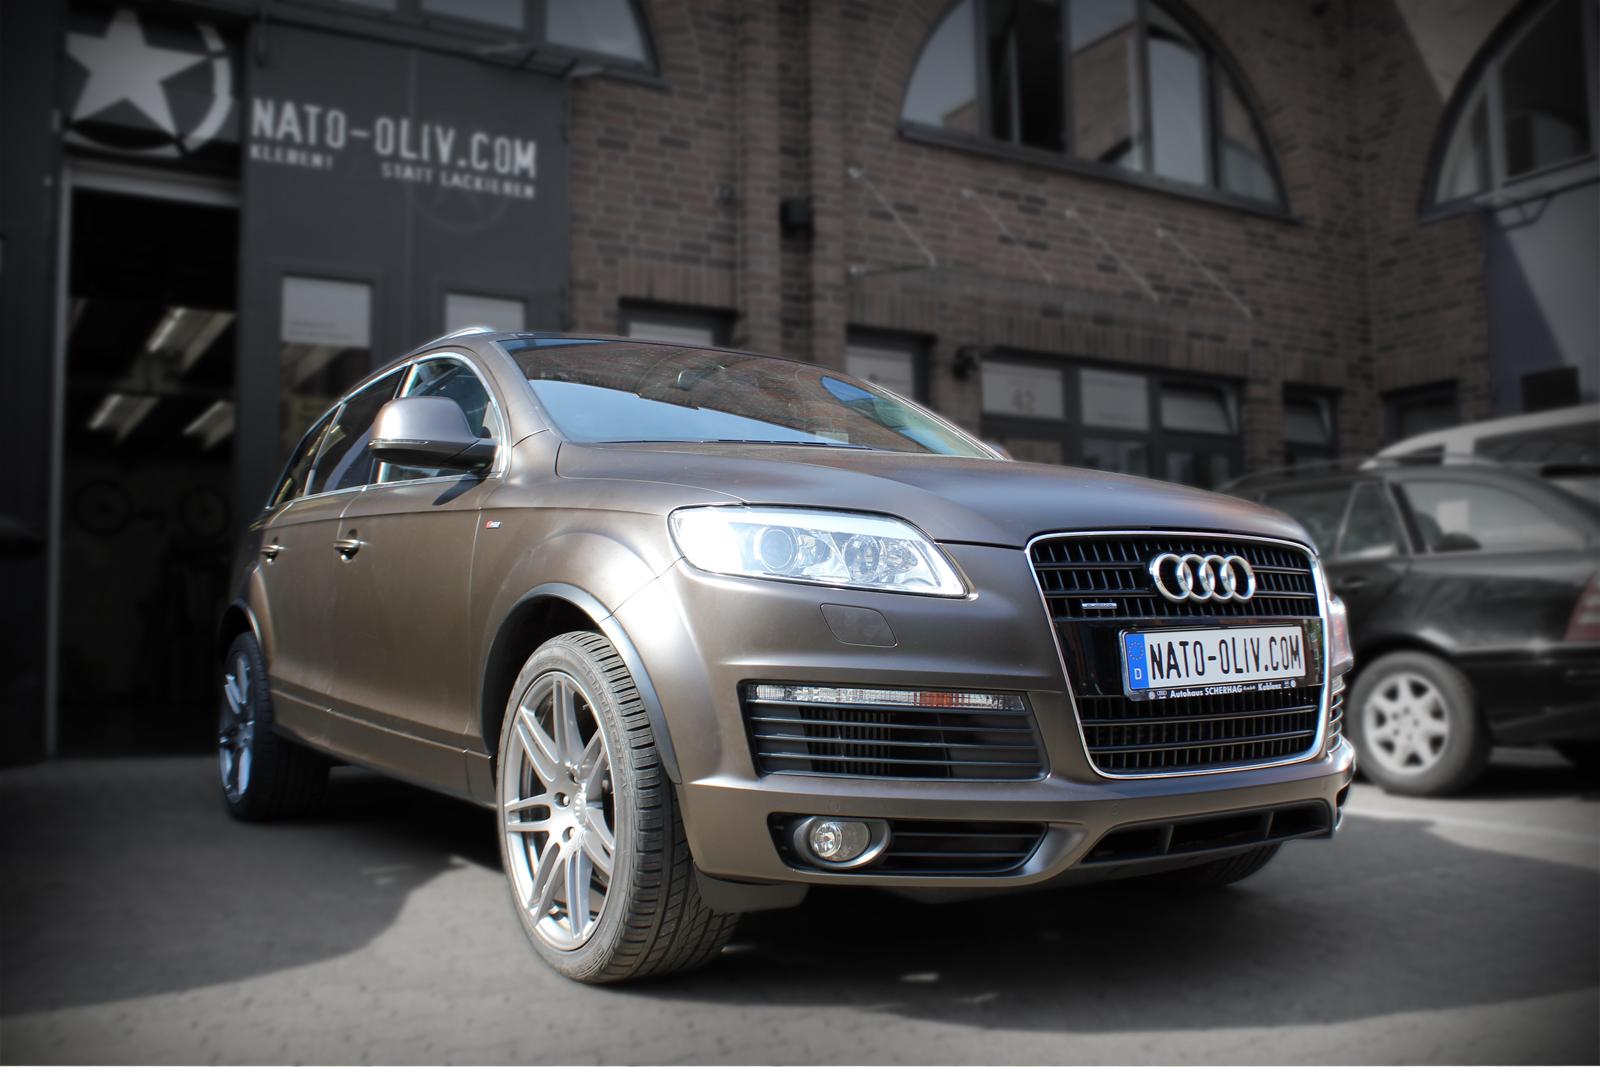 Audi_Q7_Folierung_Braun_Matt_Metallic_Titelbild